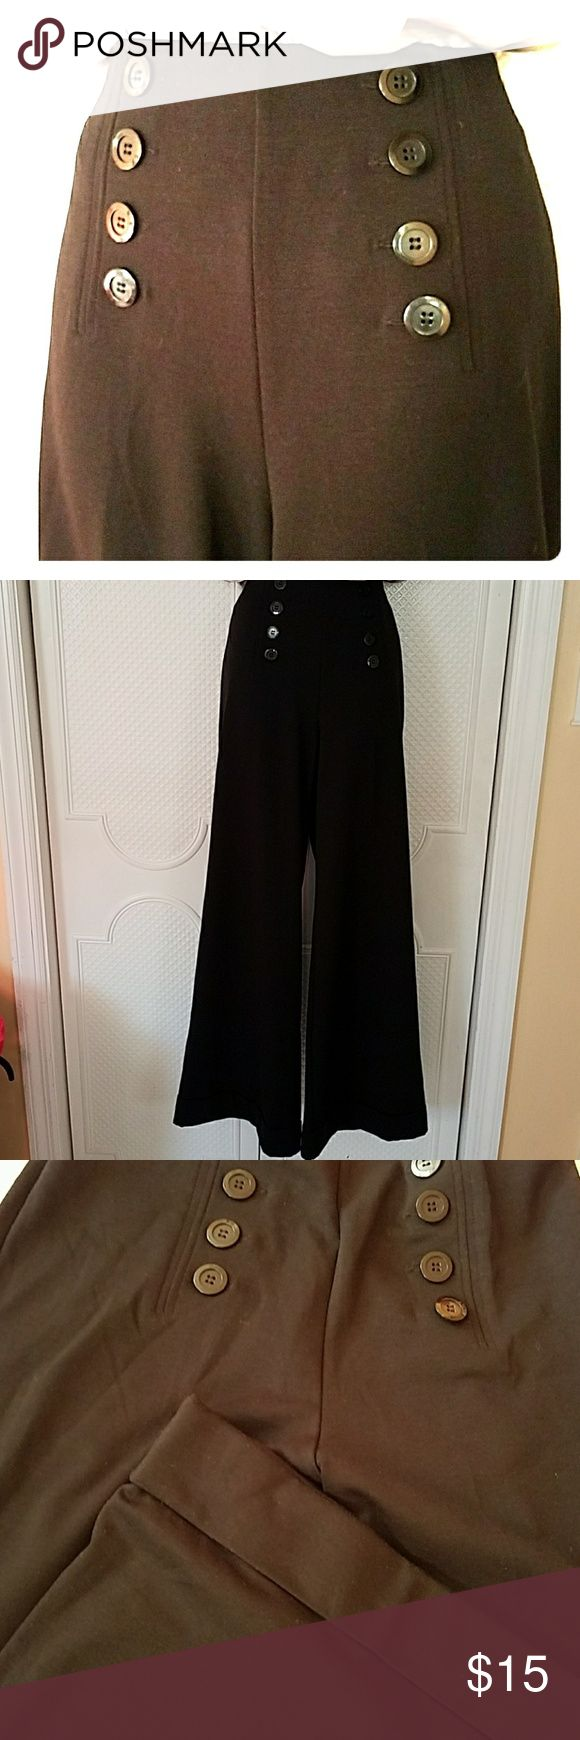 Black Nautical pants Wide leg. Side zipper with cuffs. Mock pockets on back. New York & Company Pants Boot Cut & Flare